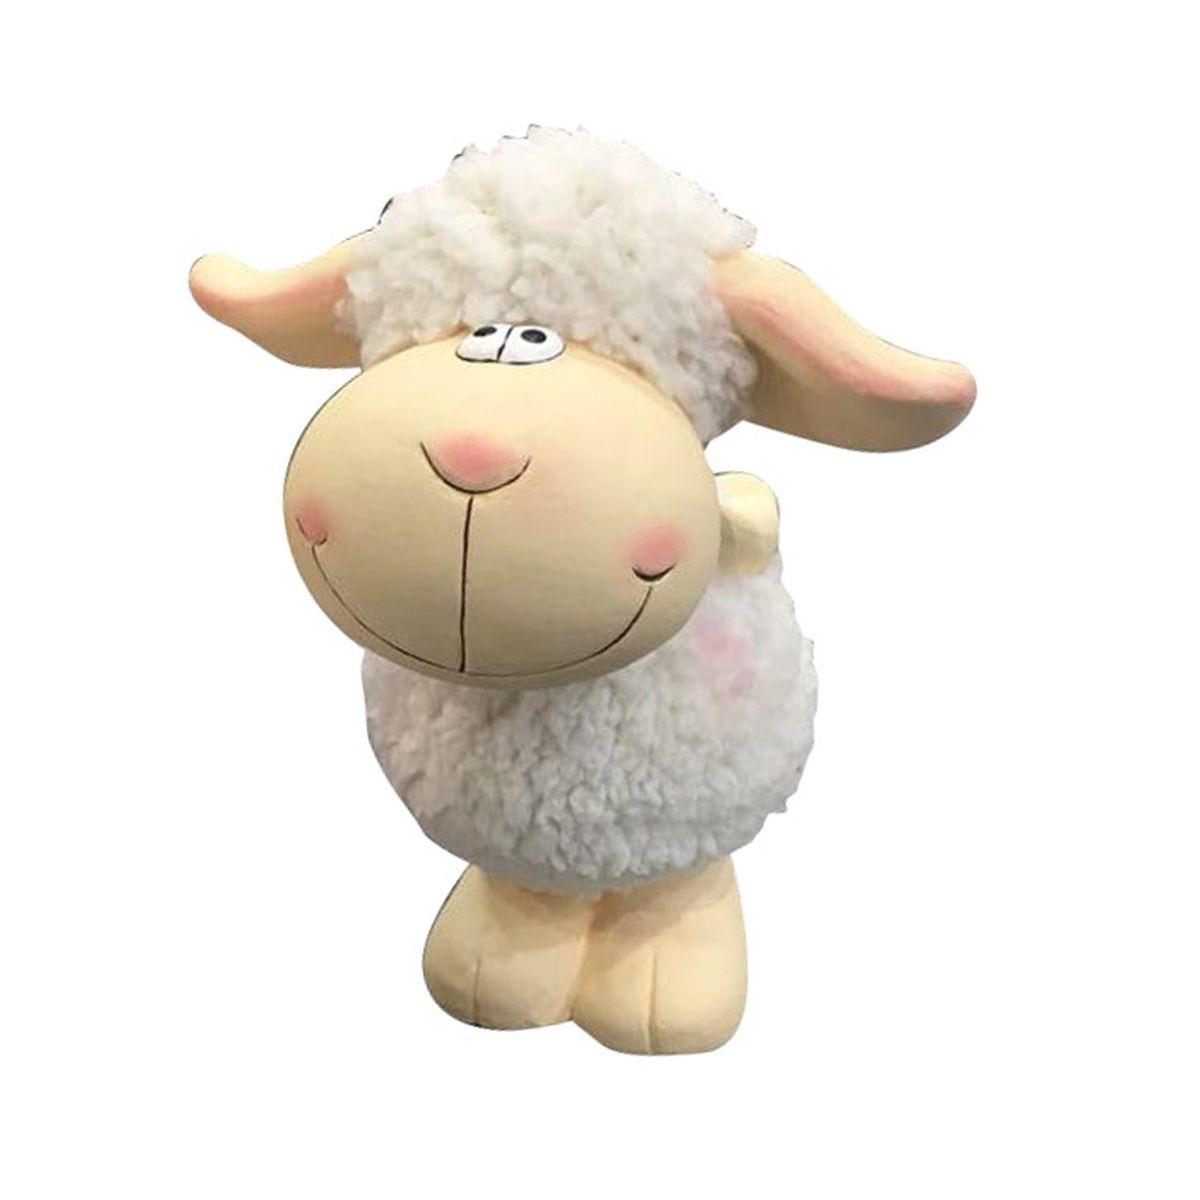 Фигурка декоративная Village People Улыбчивая овечка, бежевый, белый, 23,5 х 17 х 16 см цены онлайн